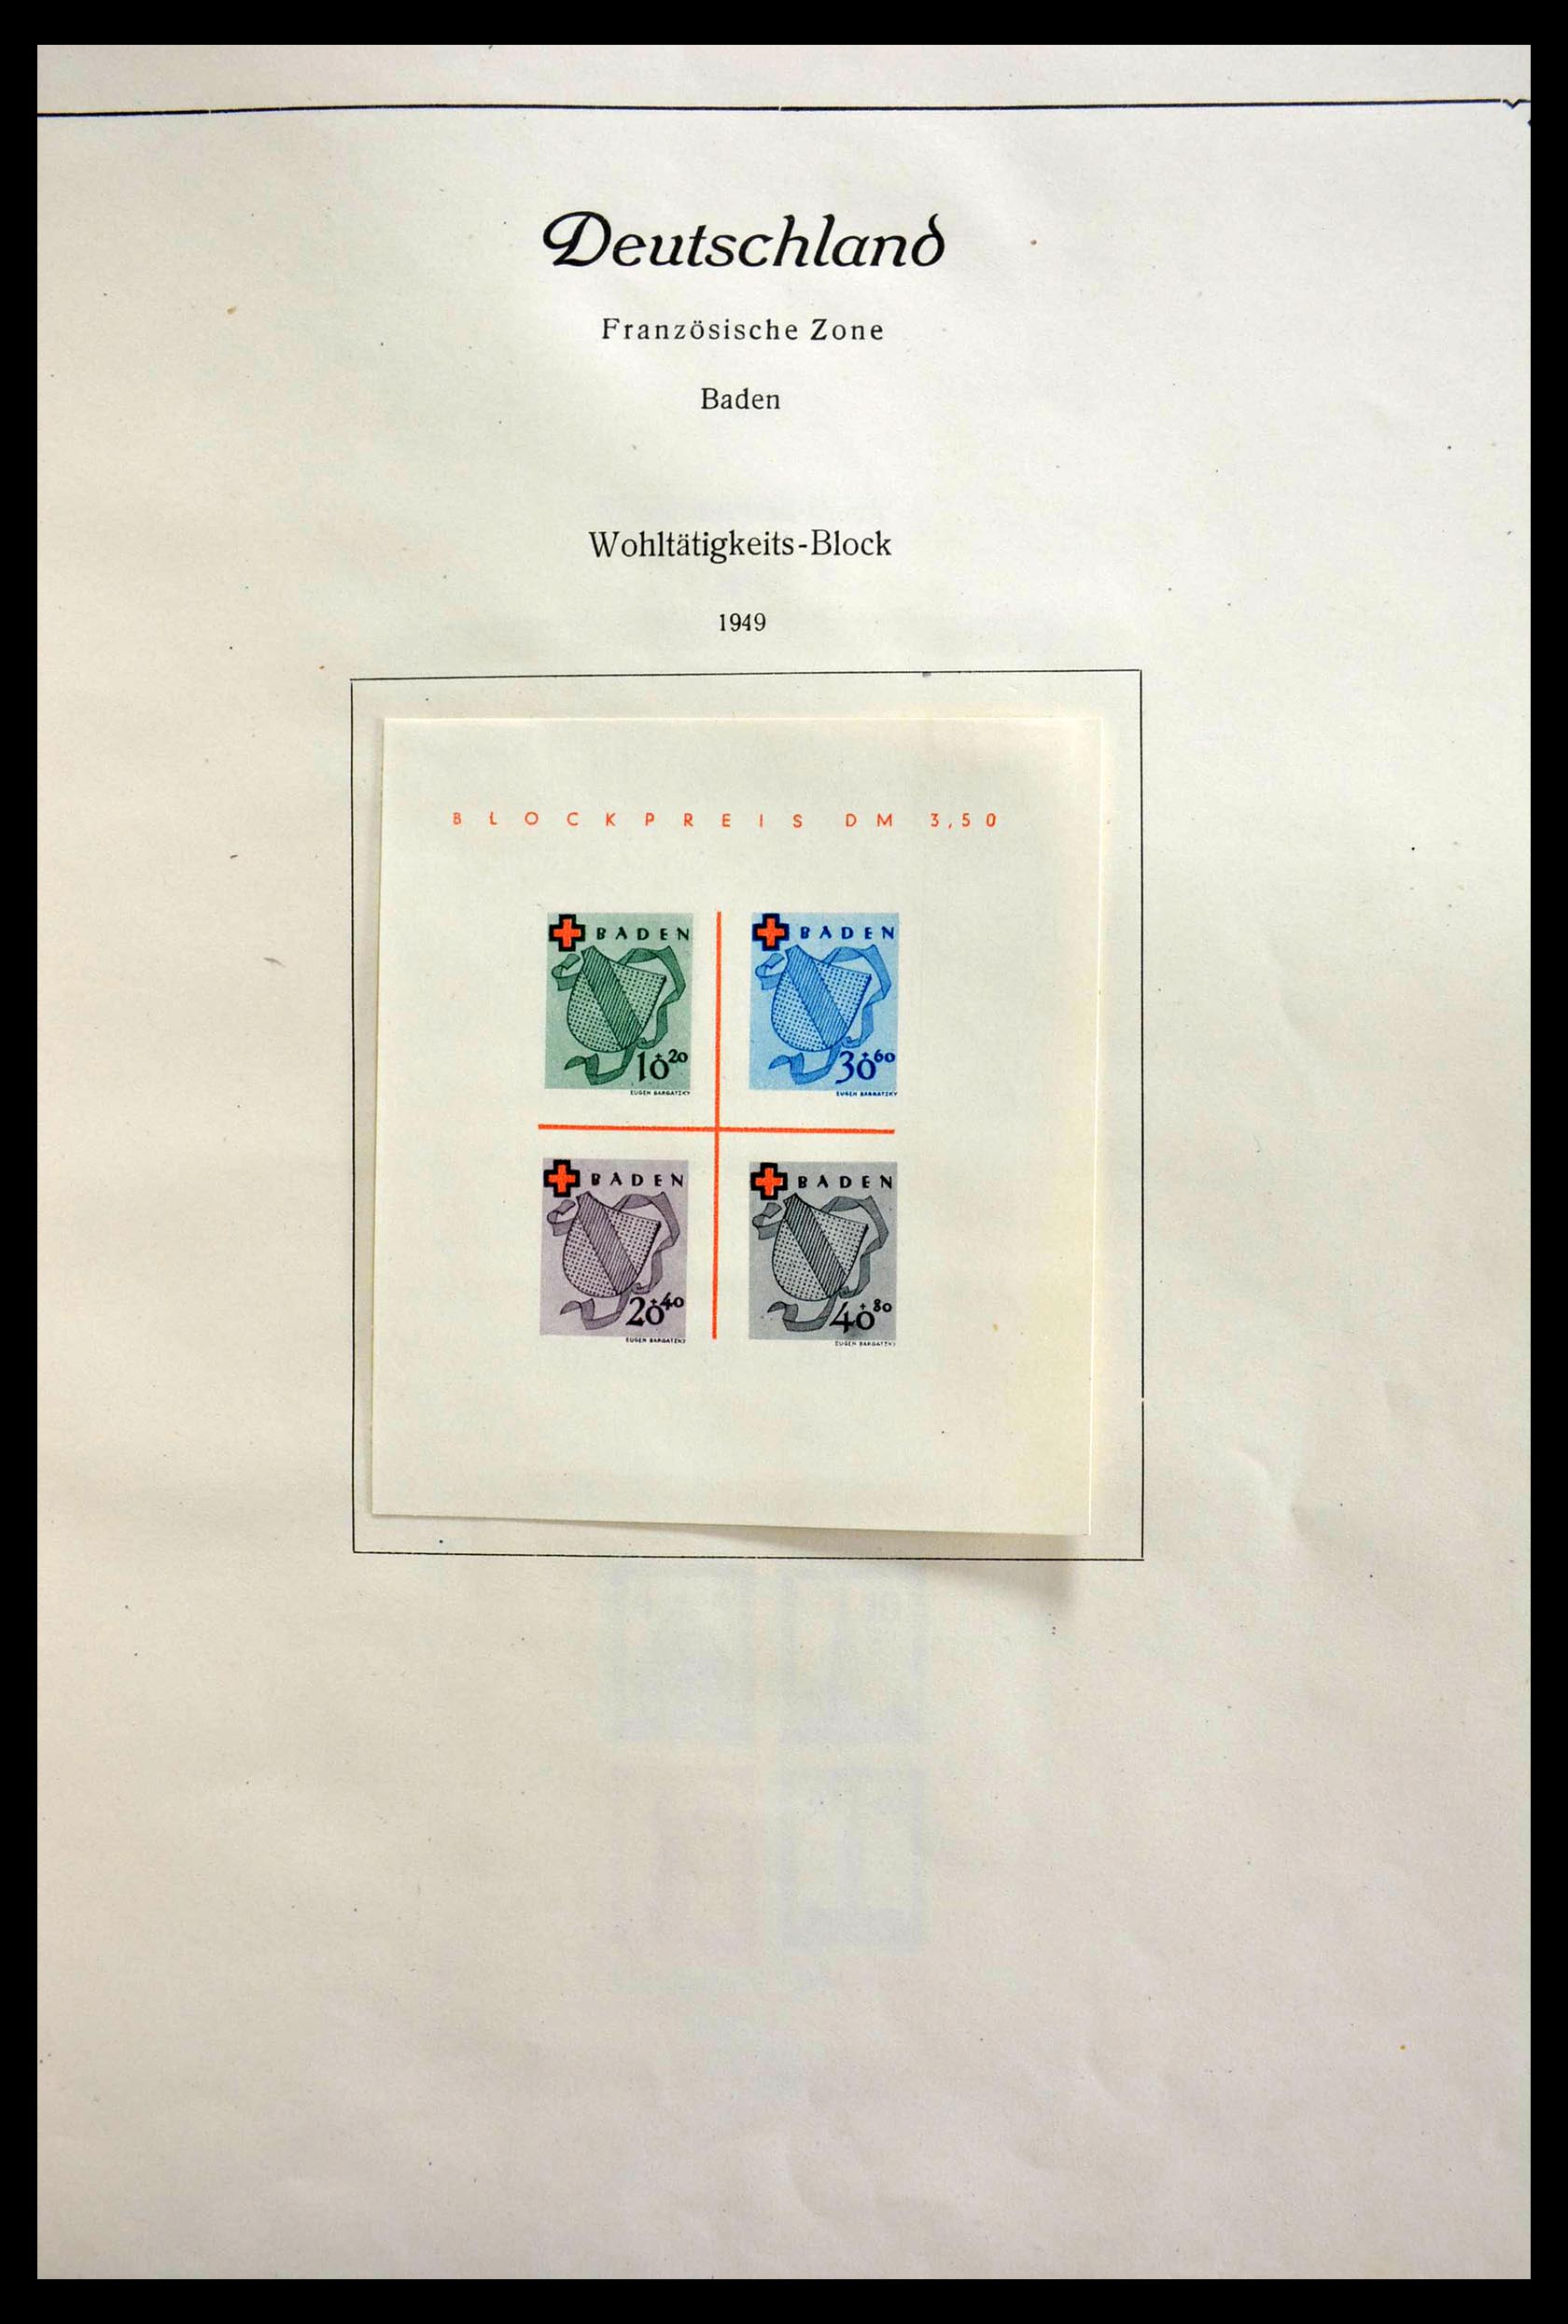 28685 010 - 28685 Germany 1946-1969.